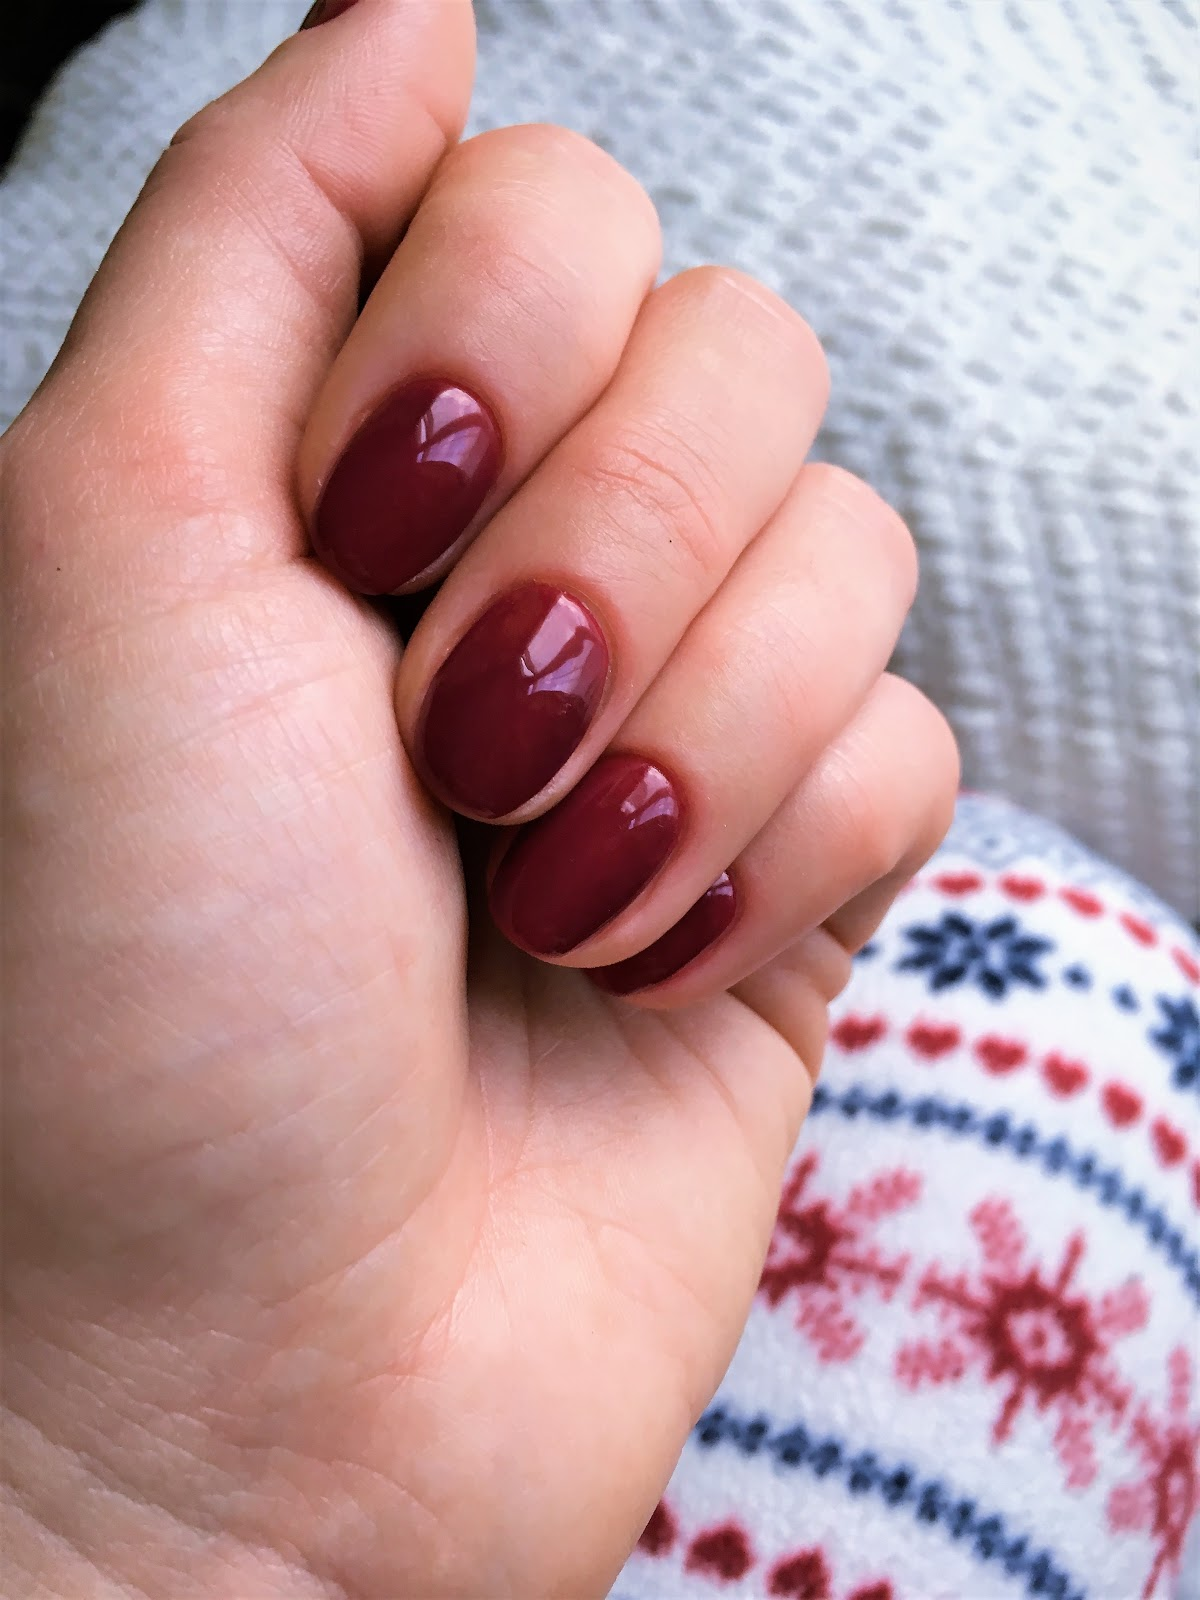 czerwień na paznokciach